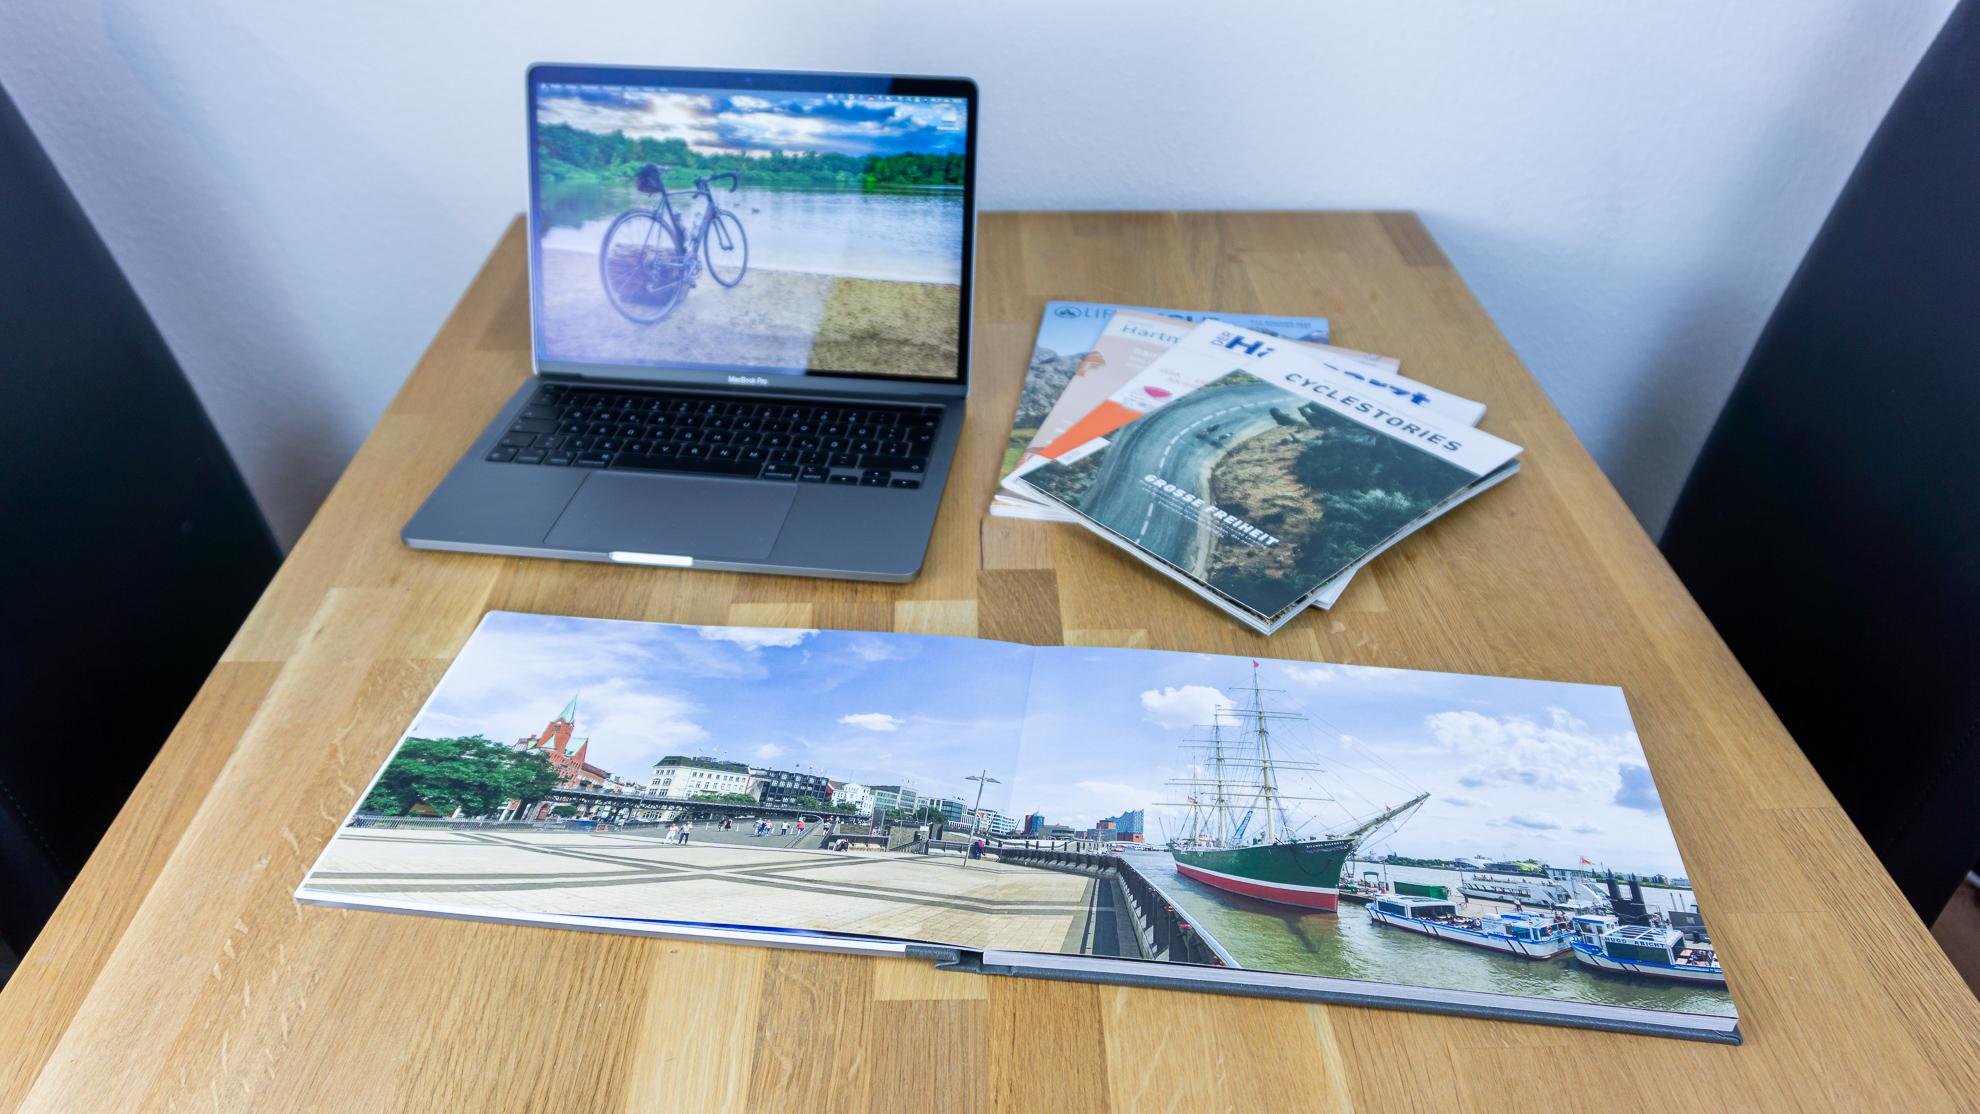 SaalDigital Fotbuch-Review - Panoramabild im Fotobuch